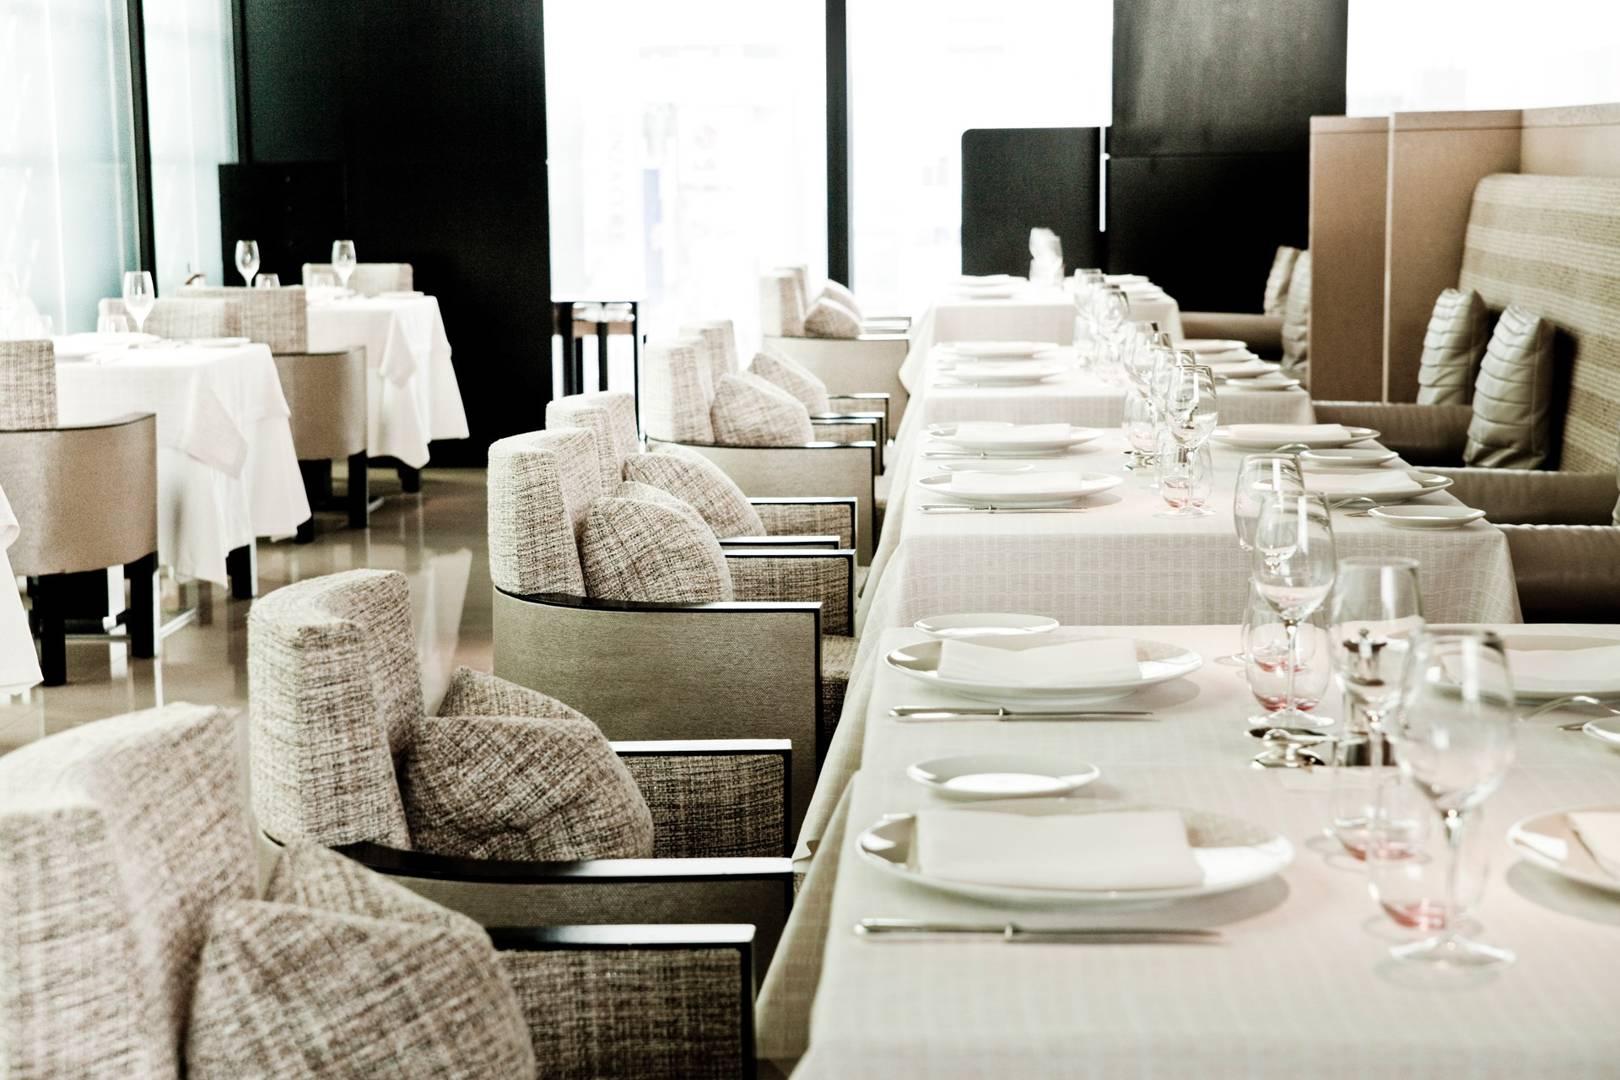 The Best Fashion Designer Restaurants Cafés And Bars CN Traveller - 7 of the coolest restaurants in tokyo